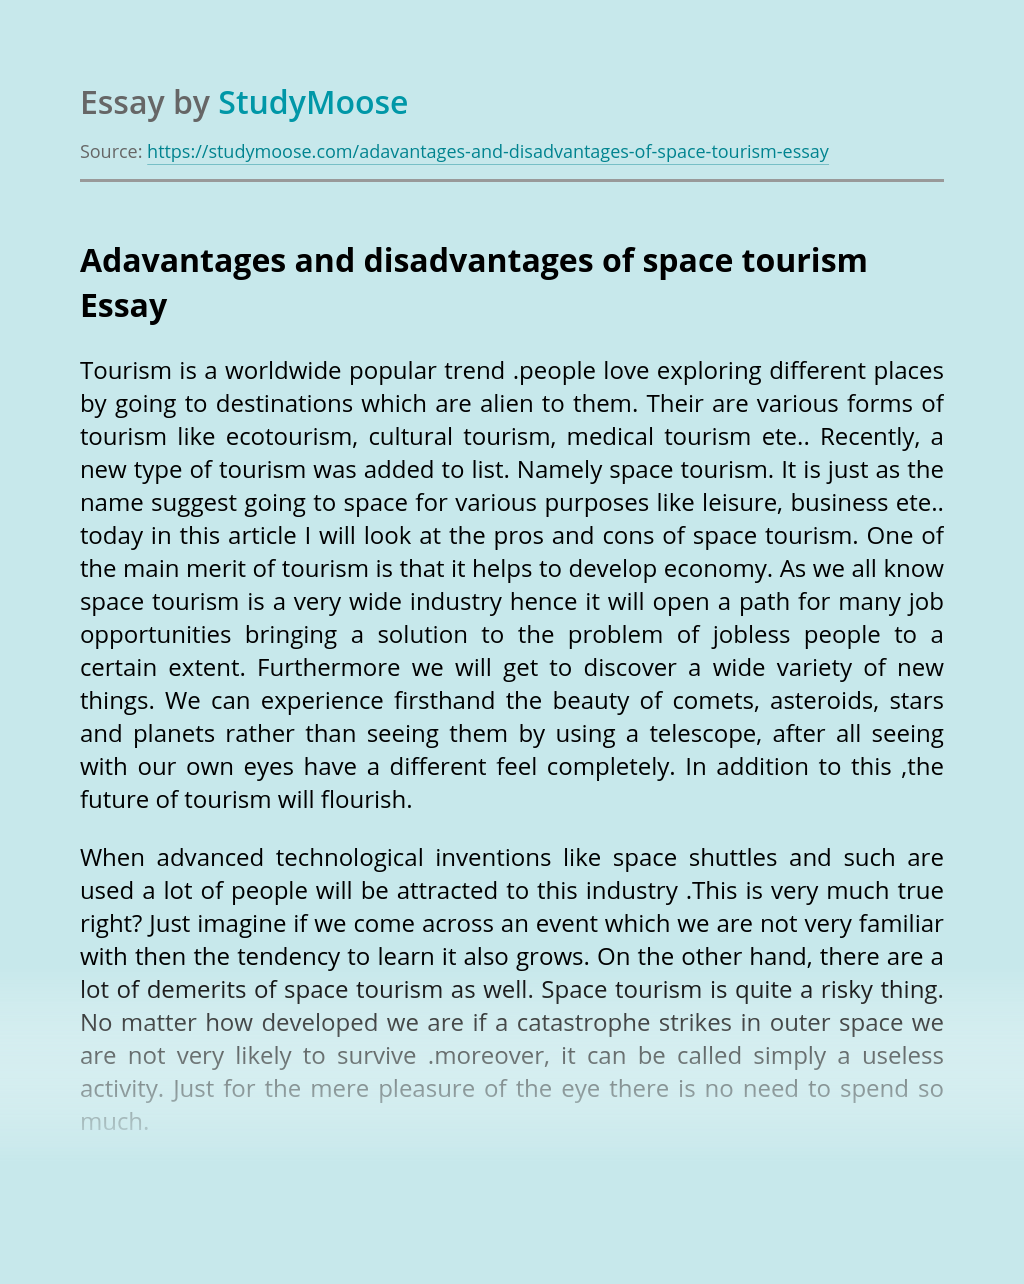 Adavantages and disadvantages of space tourism